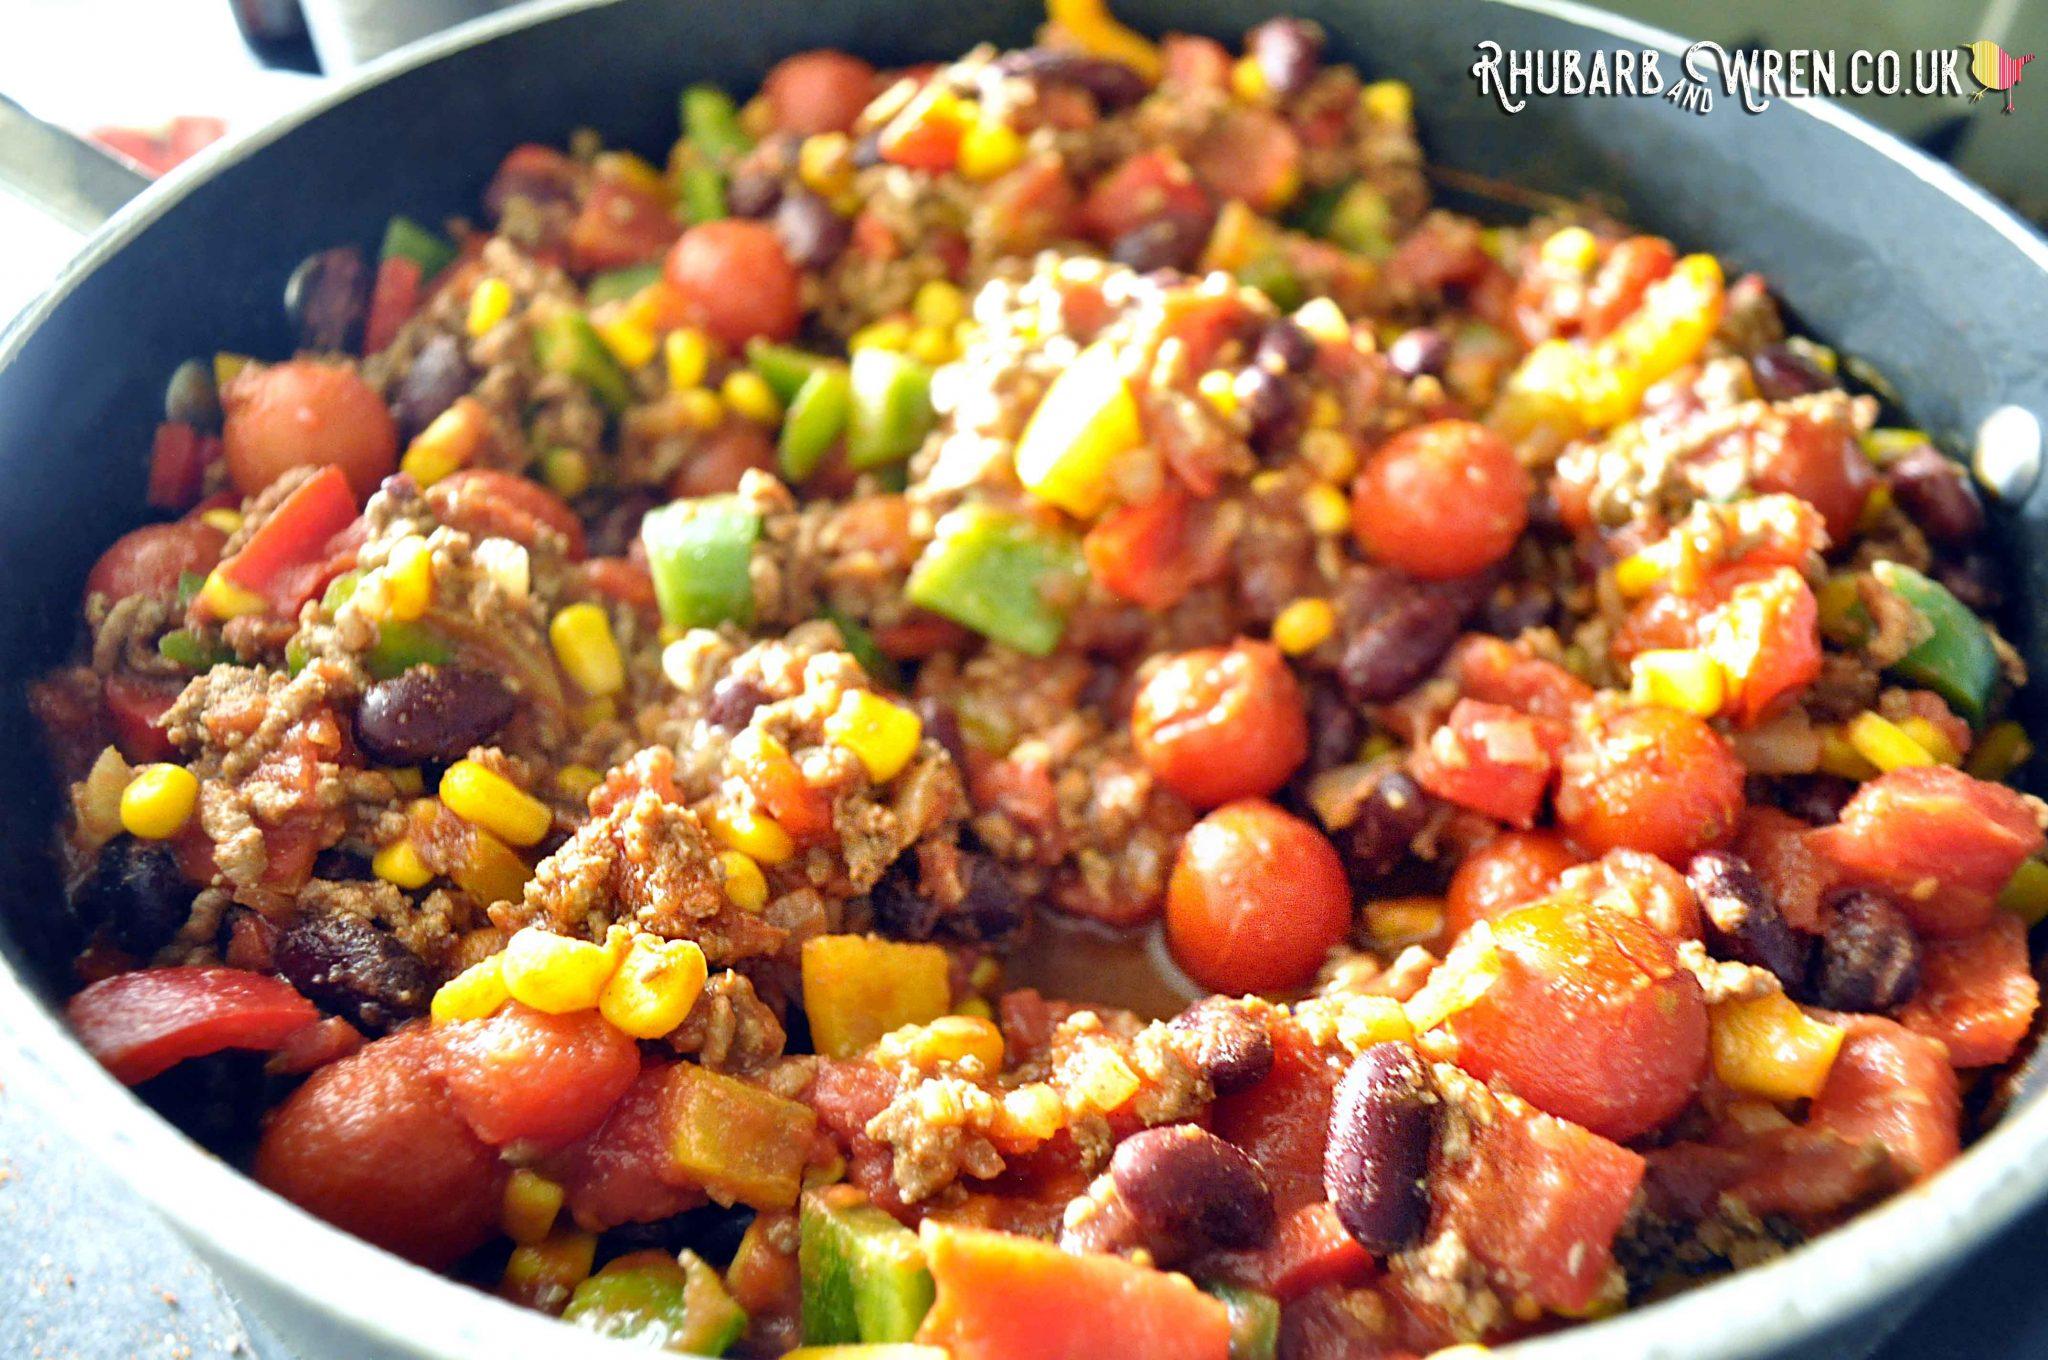 Family friendly recipe for beef or vegan chilli dinner